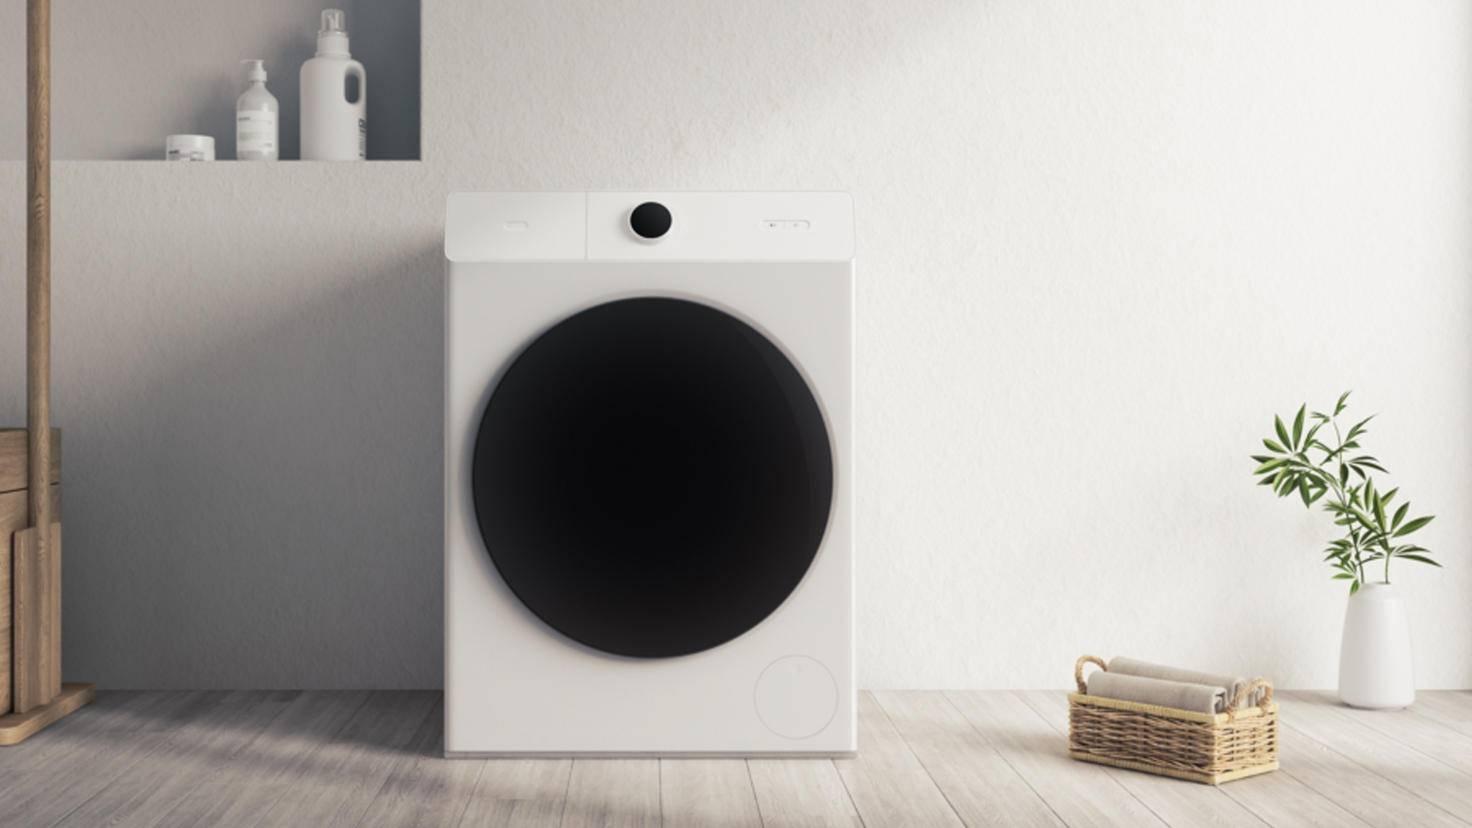 Mi Smart Combo Wash Dryer Pro Kombi-Waschmaschine-Xiaomi